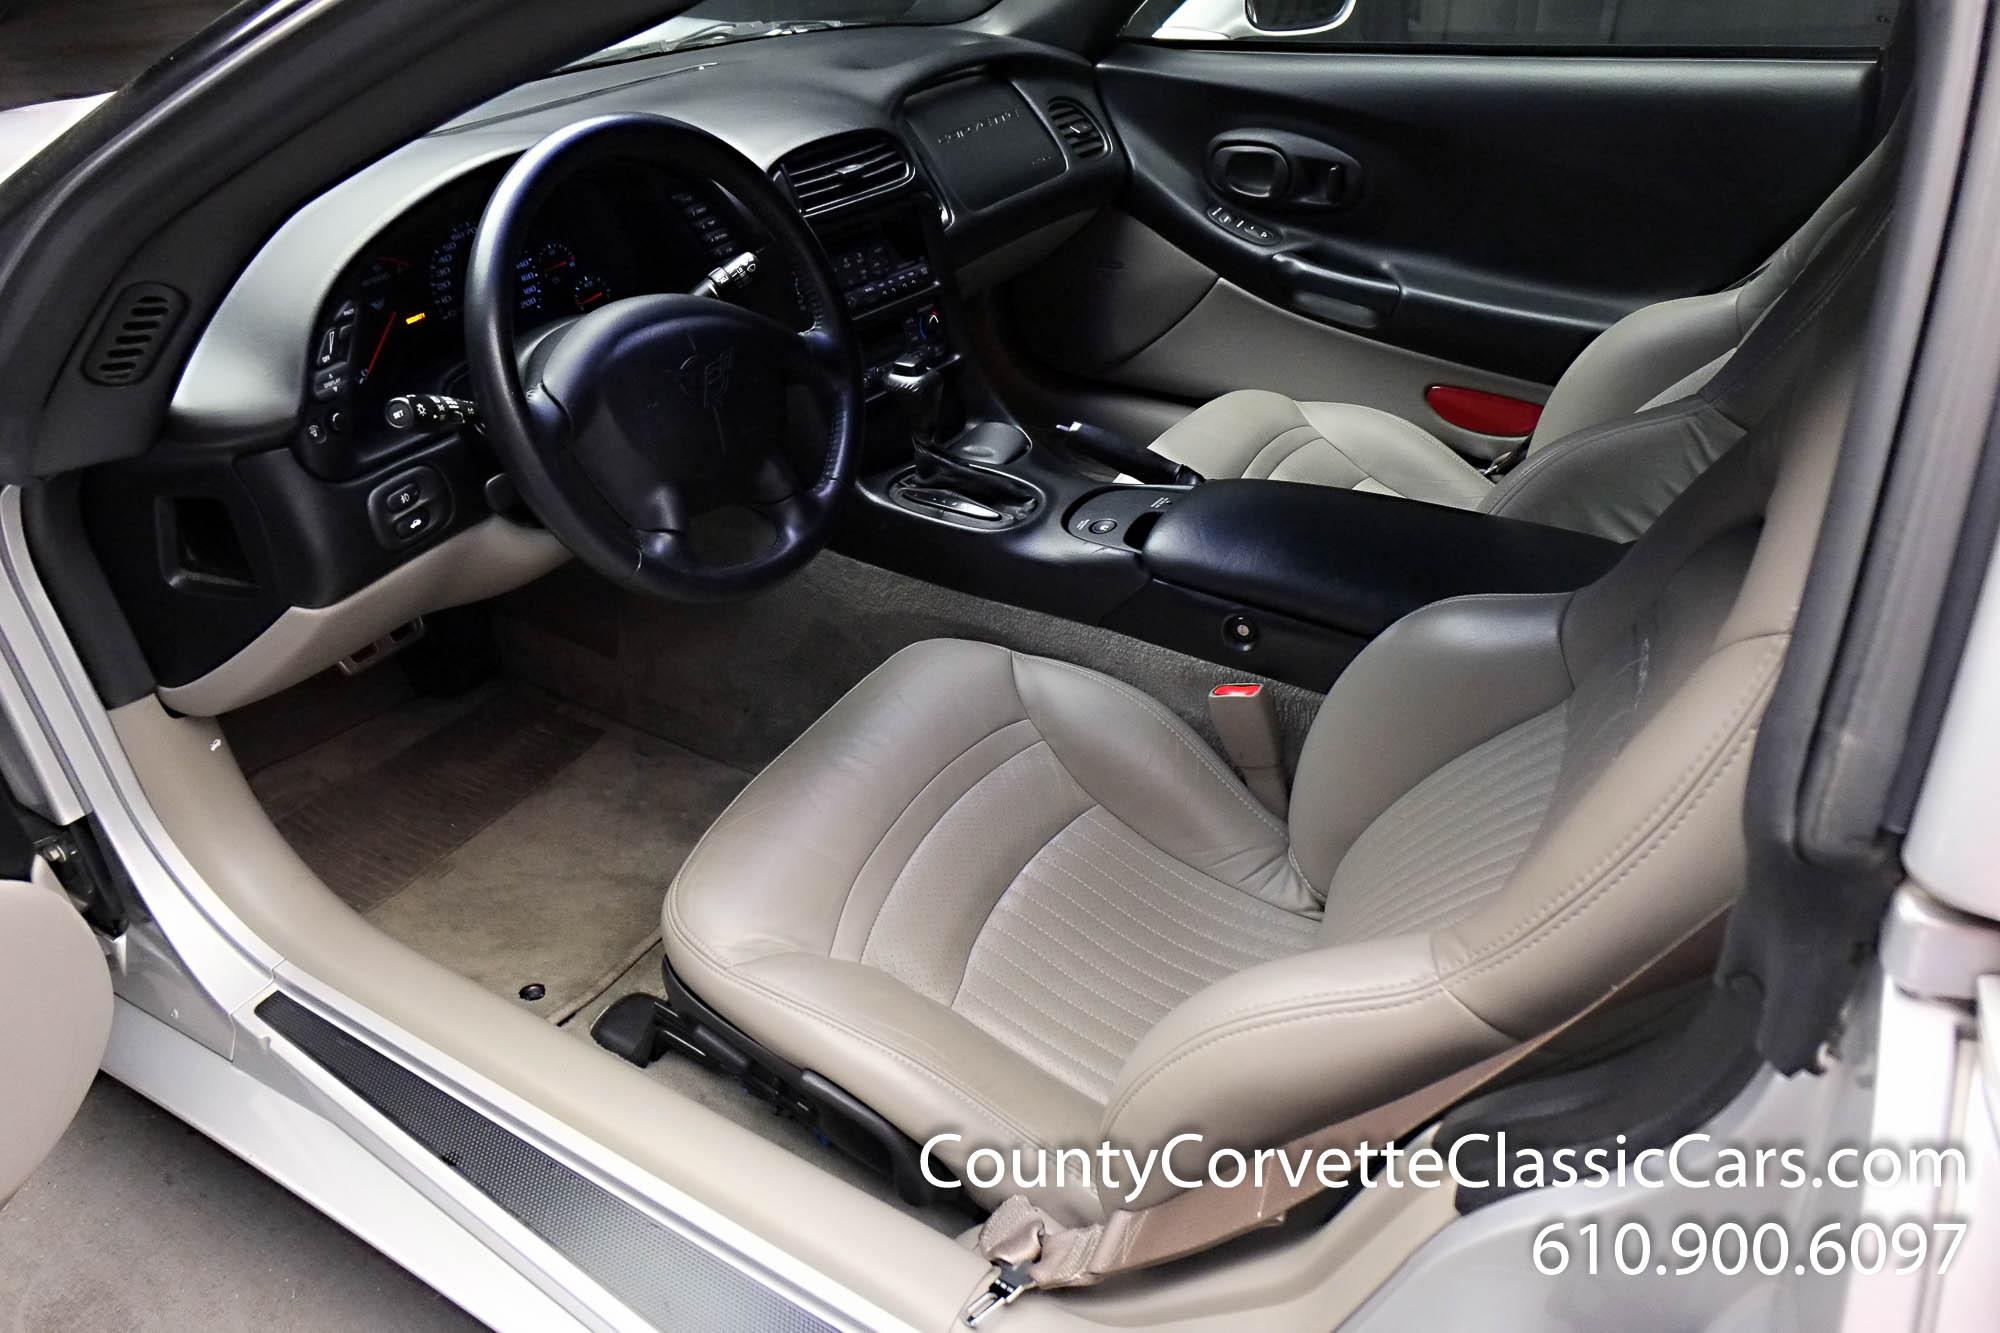 2002-Corvette-Coupe-10.jpg